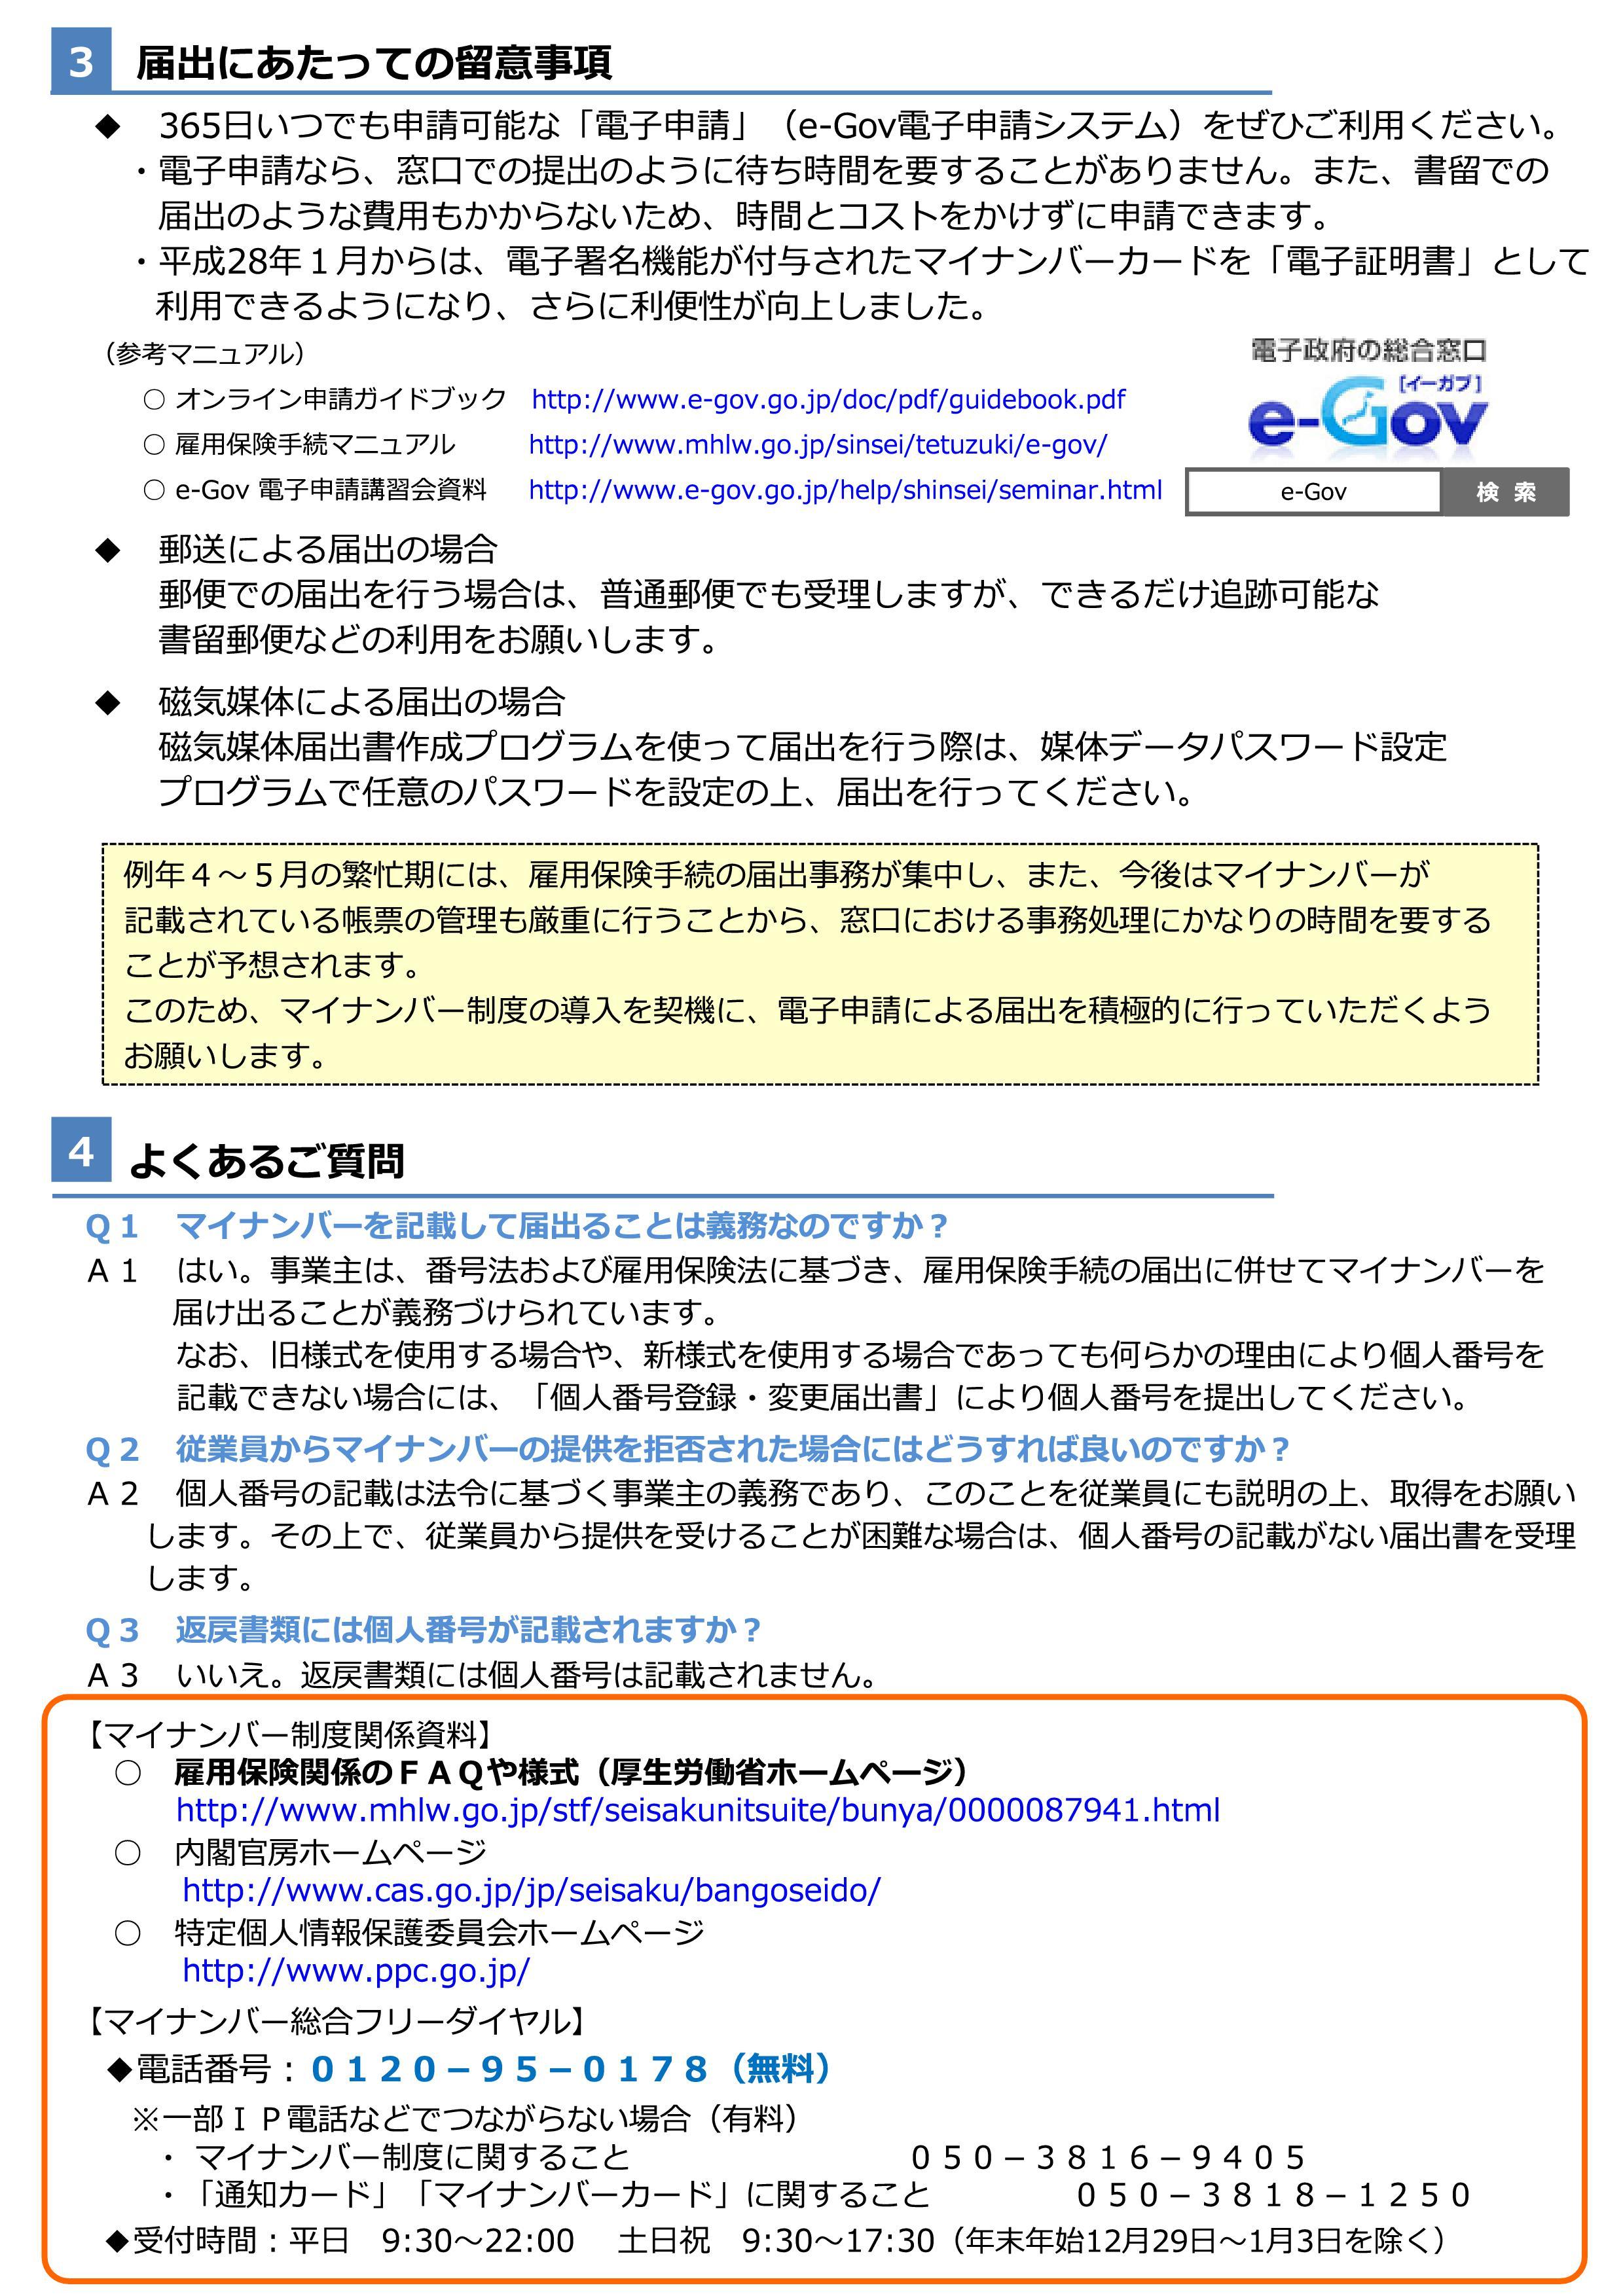 koyouhoken-002.jpg